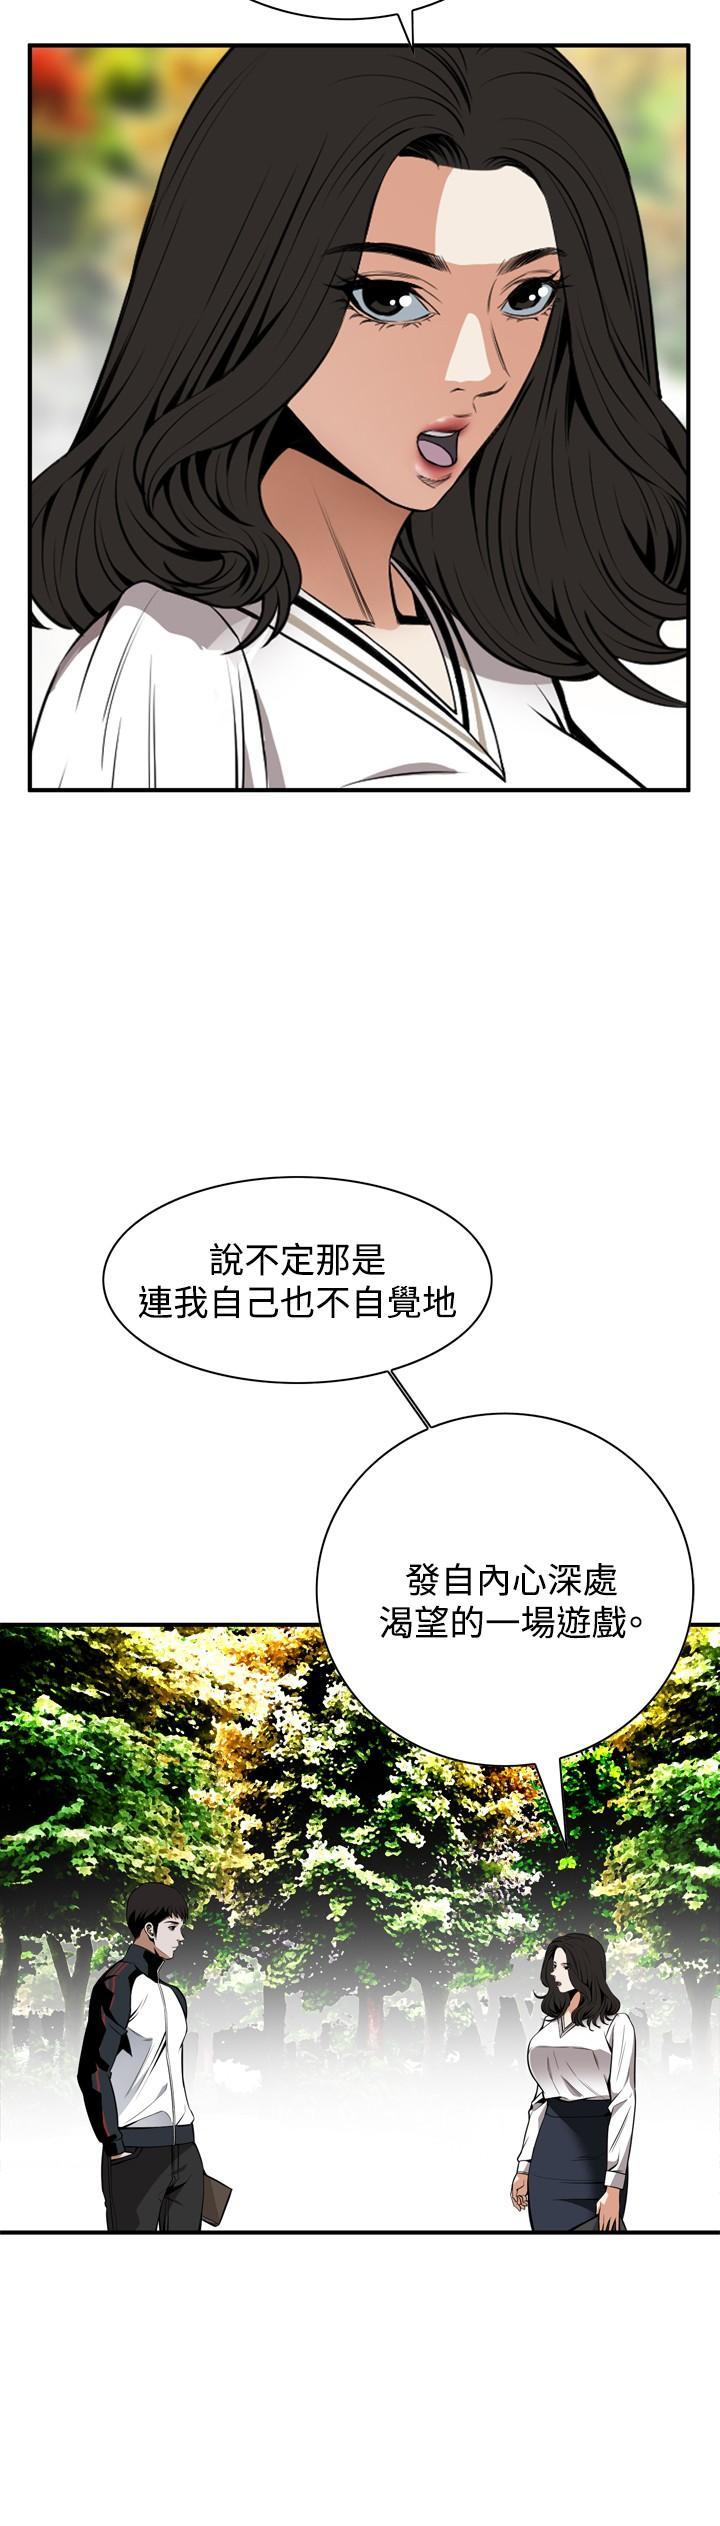 Take a Peek 偷窥 Ch.39~51 [Chinese]中文 97